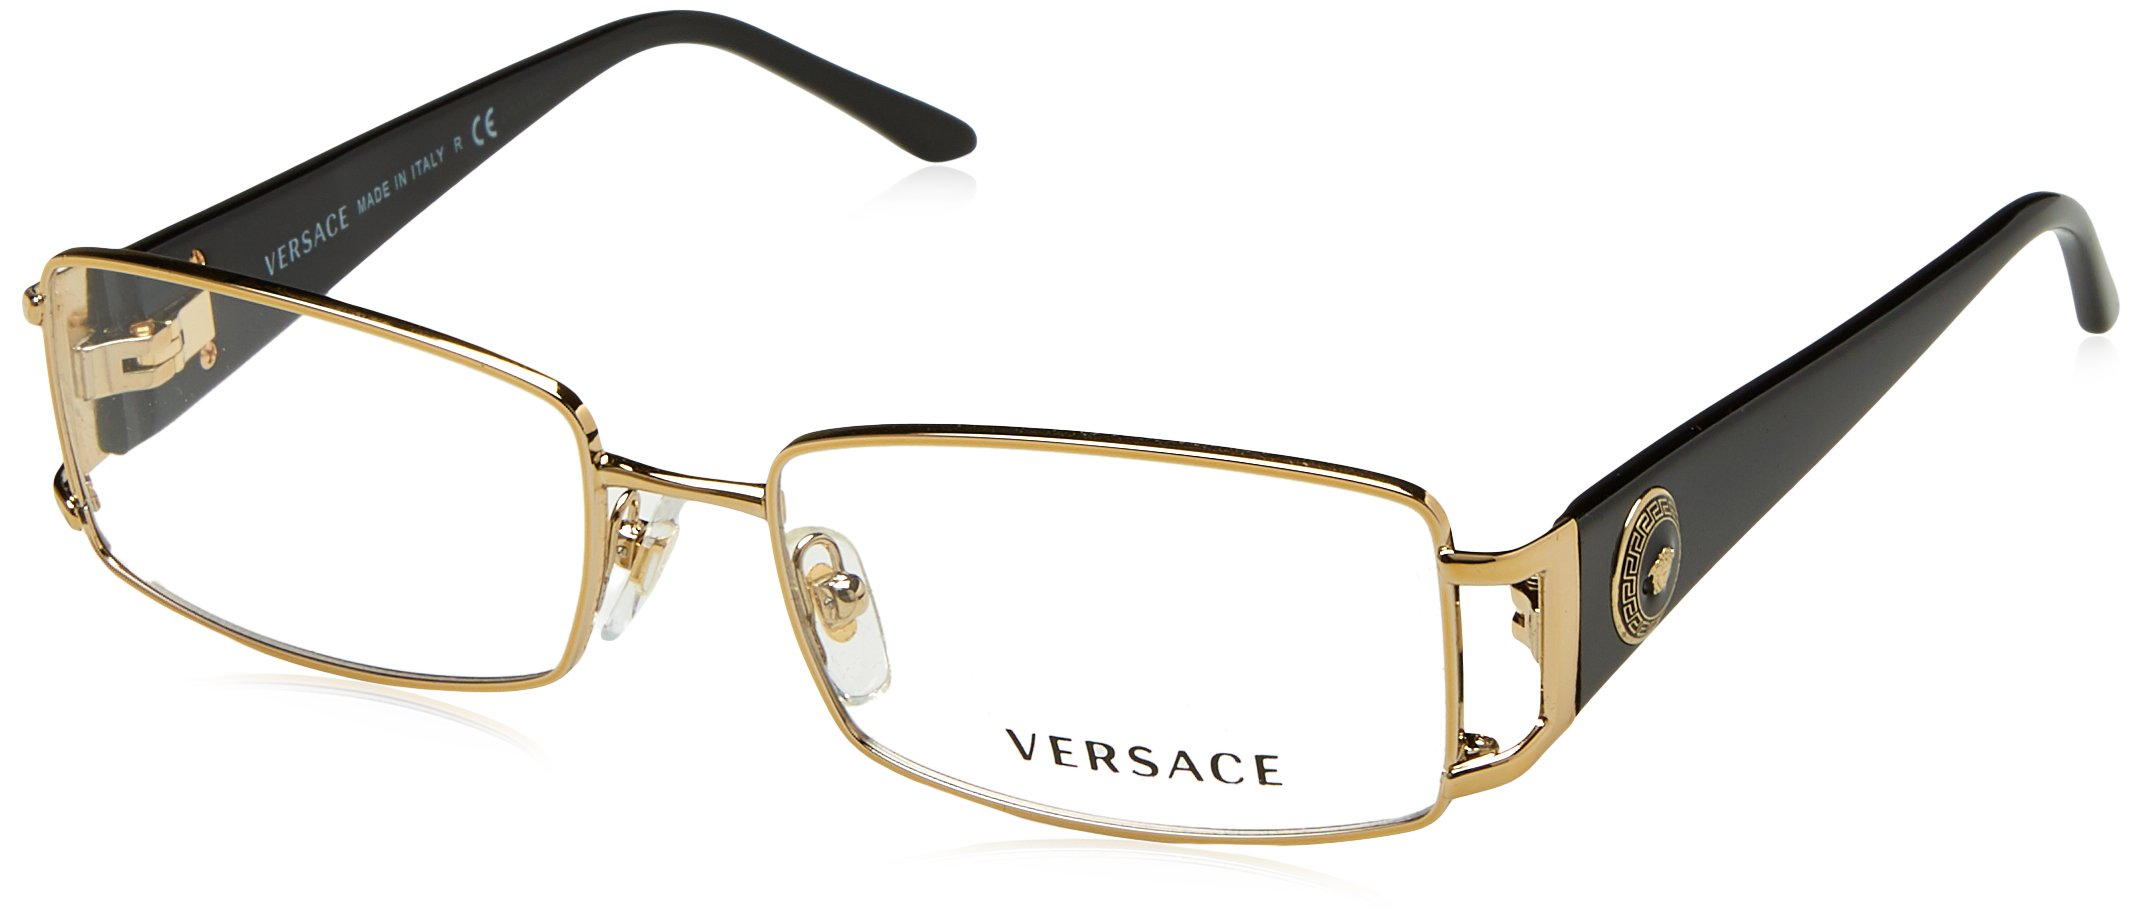 Versace VE1163M Eyeglass Frames 1252-52 - Pale Gold VE1163M-1252-52 by Versace